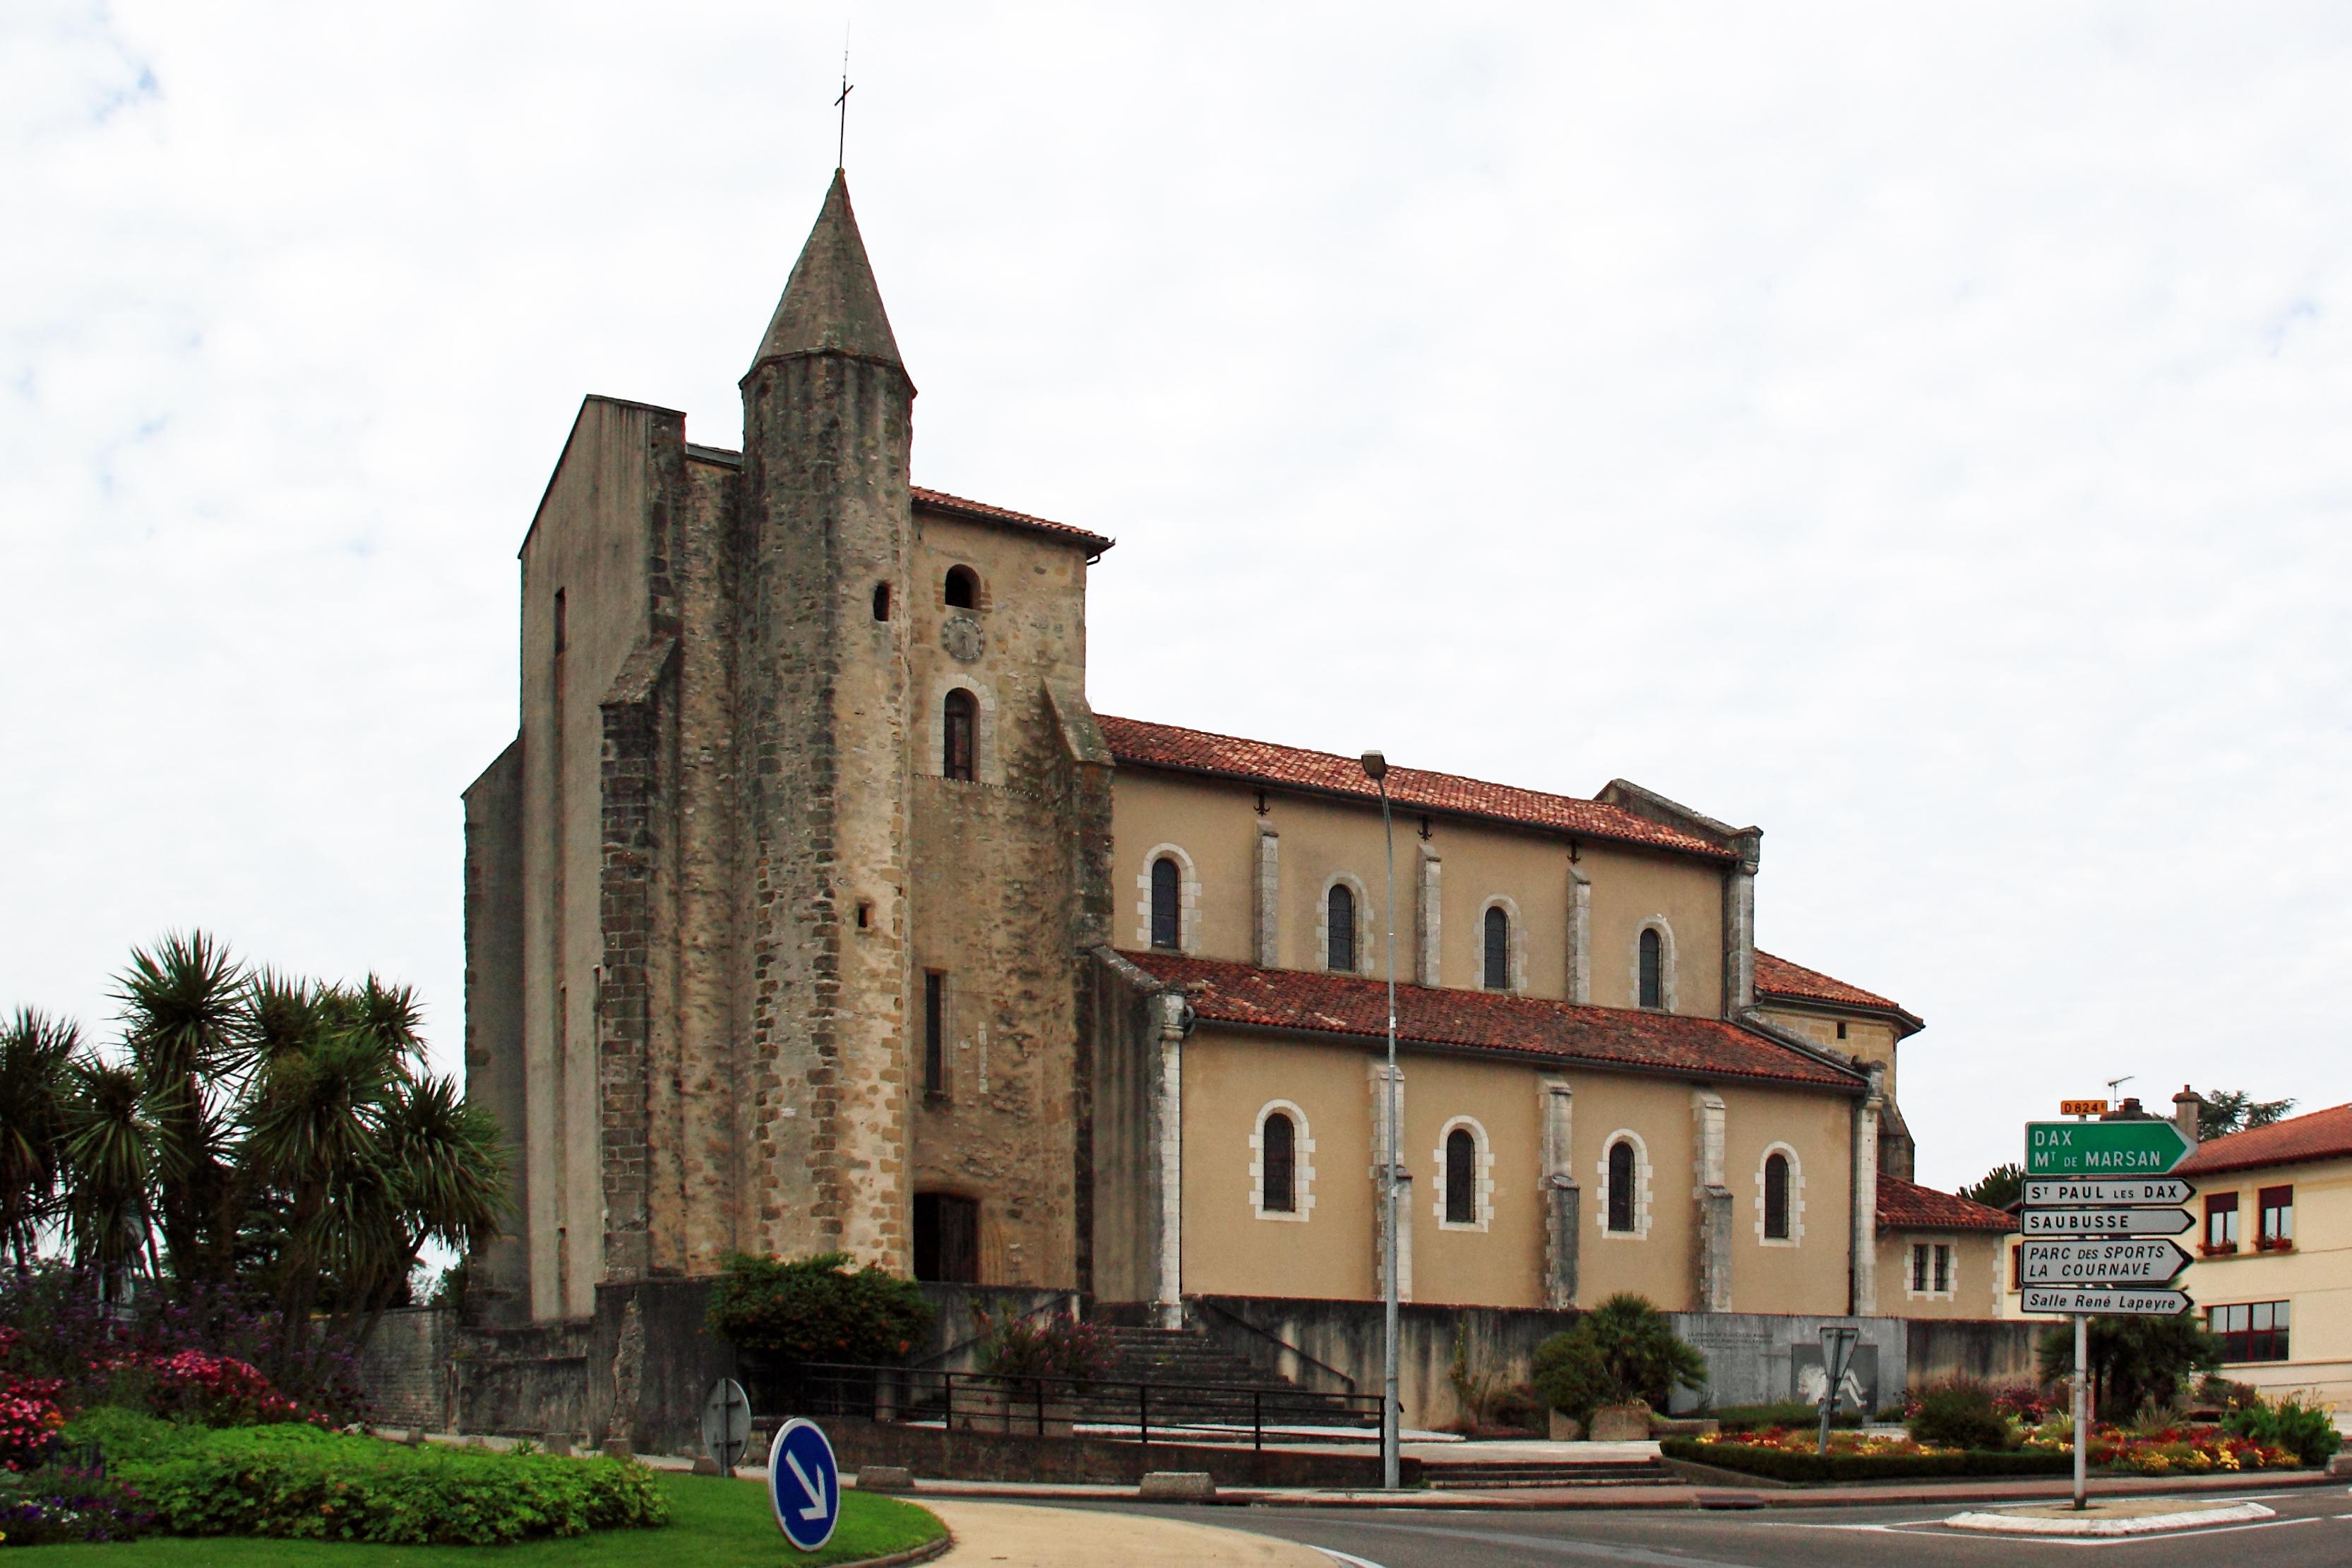 Saint-Geours-de-Maremne